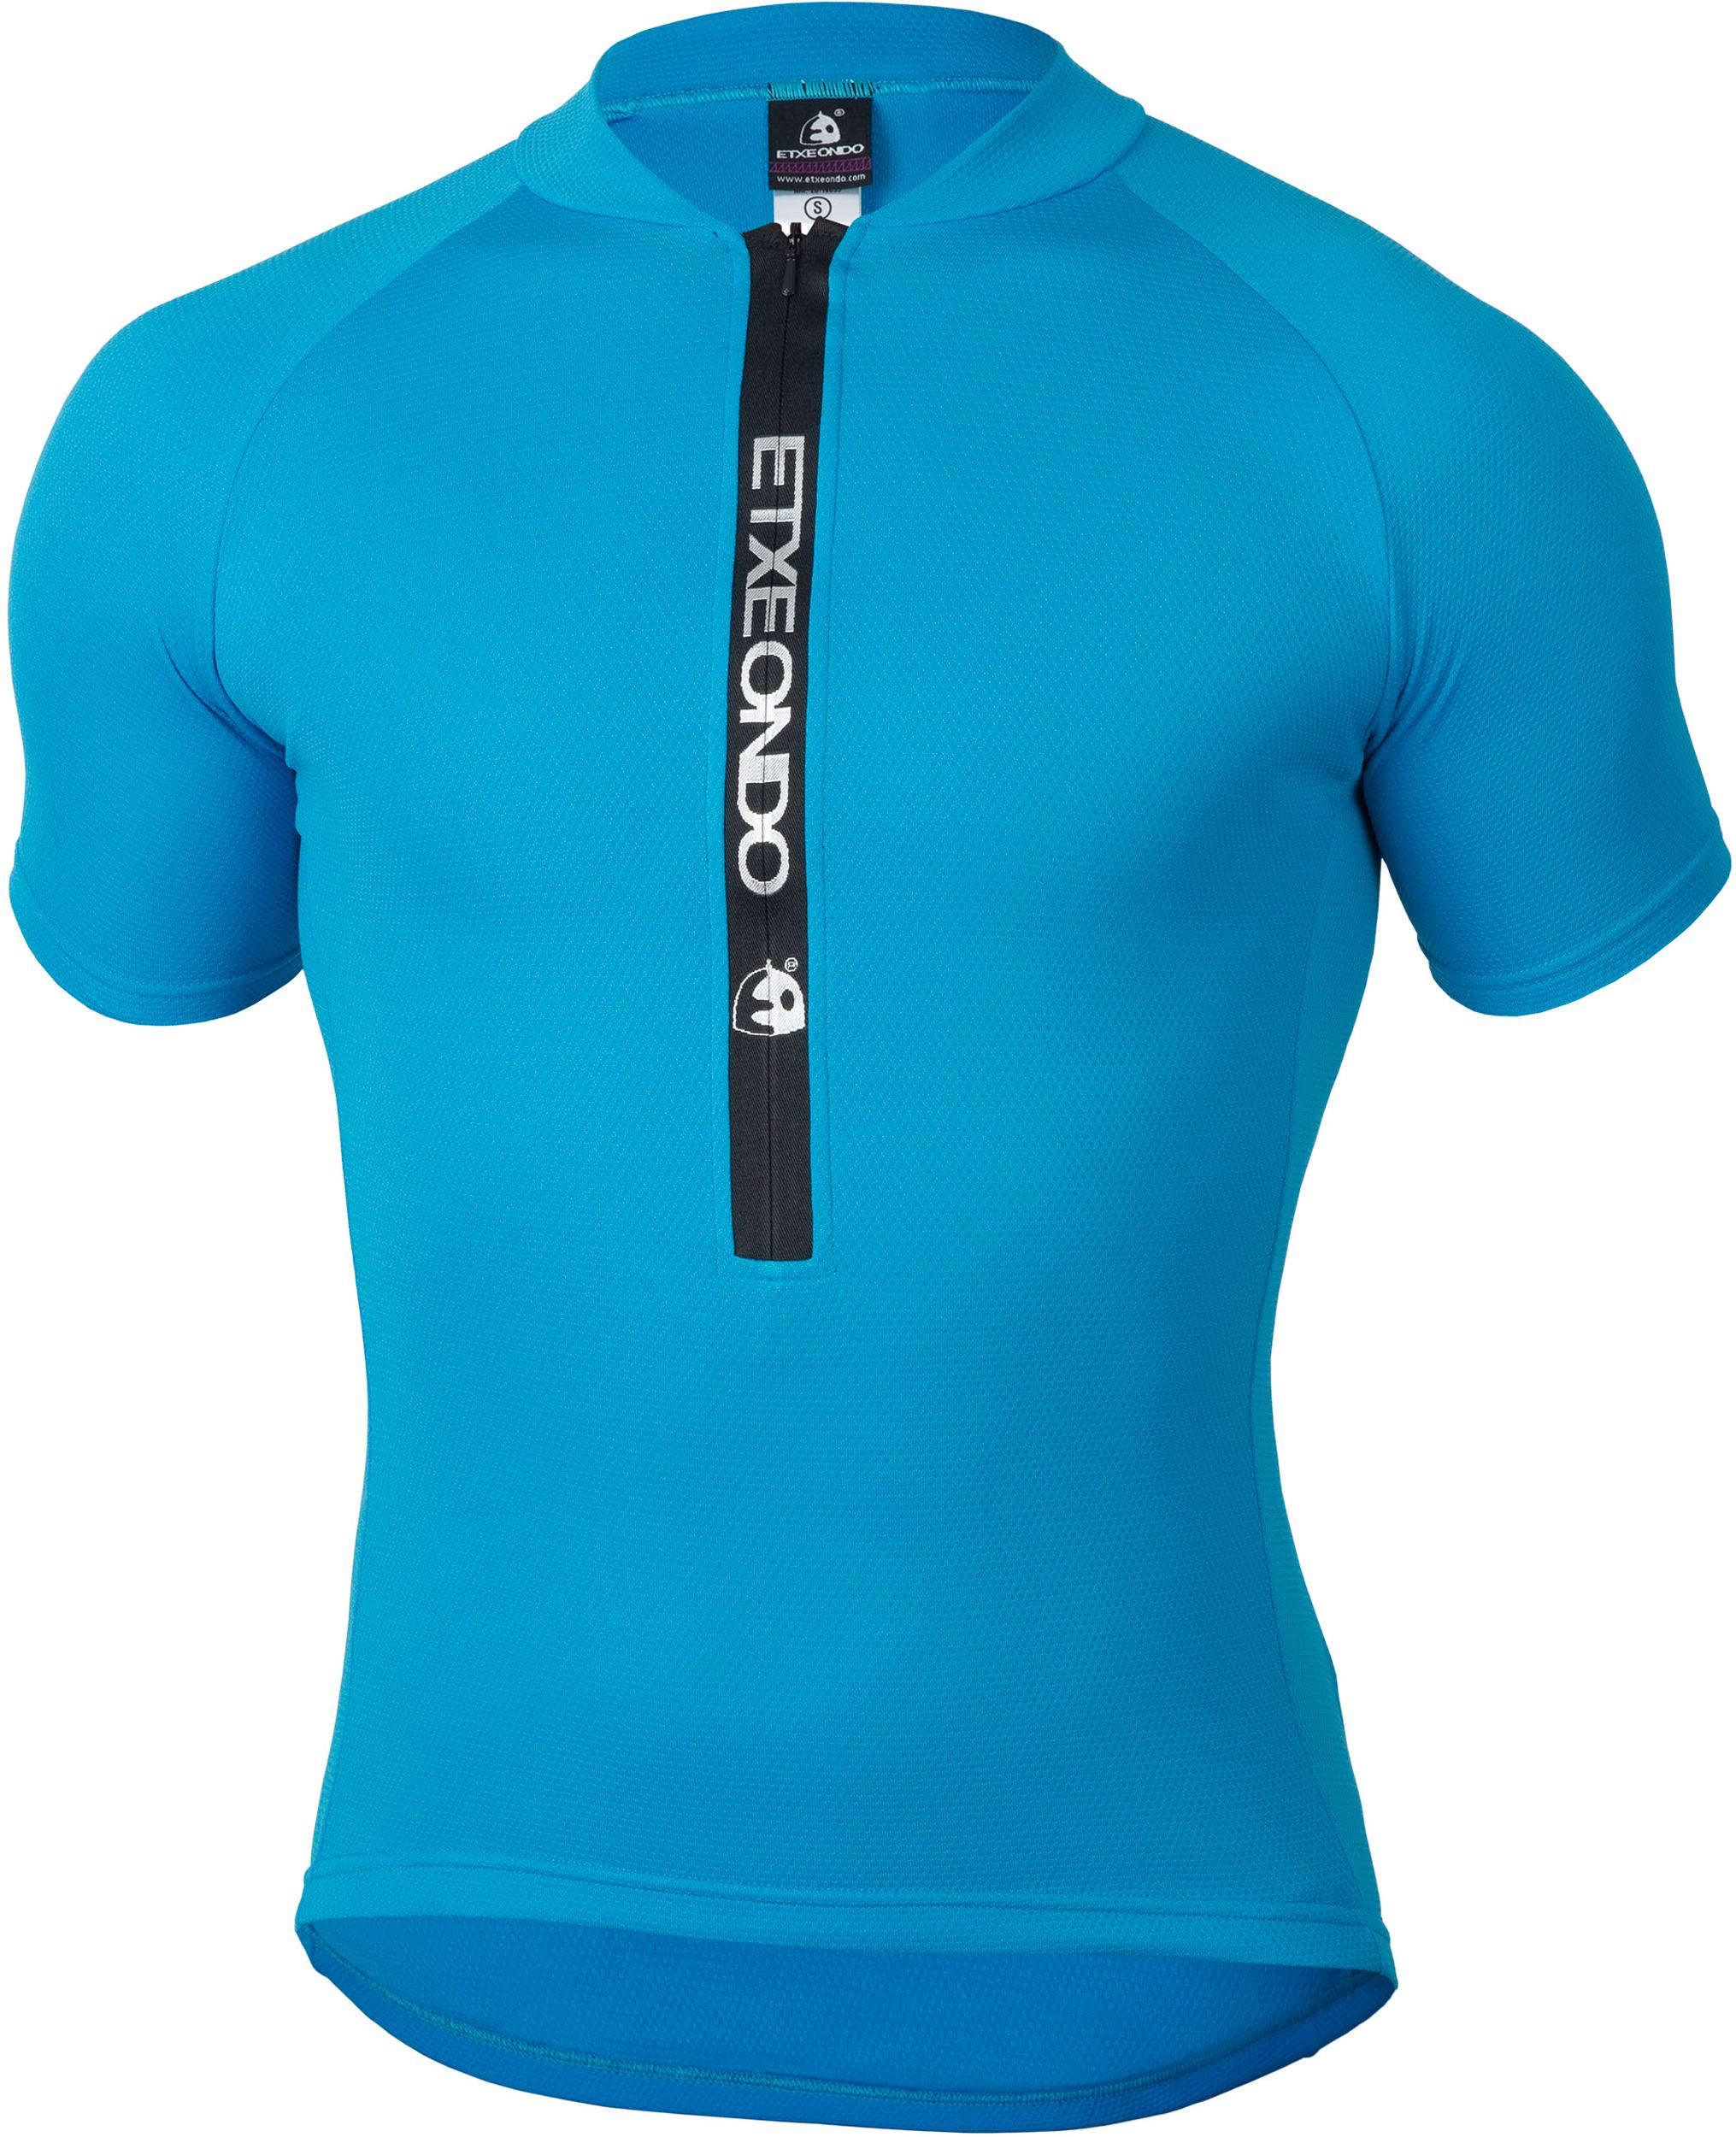 2031x2500 Wiggle Etxeondo Laua Short Sleeve Jersey Short Sleeve Cycling